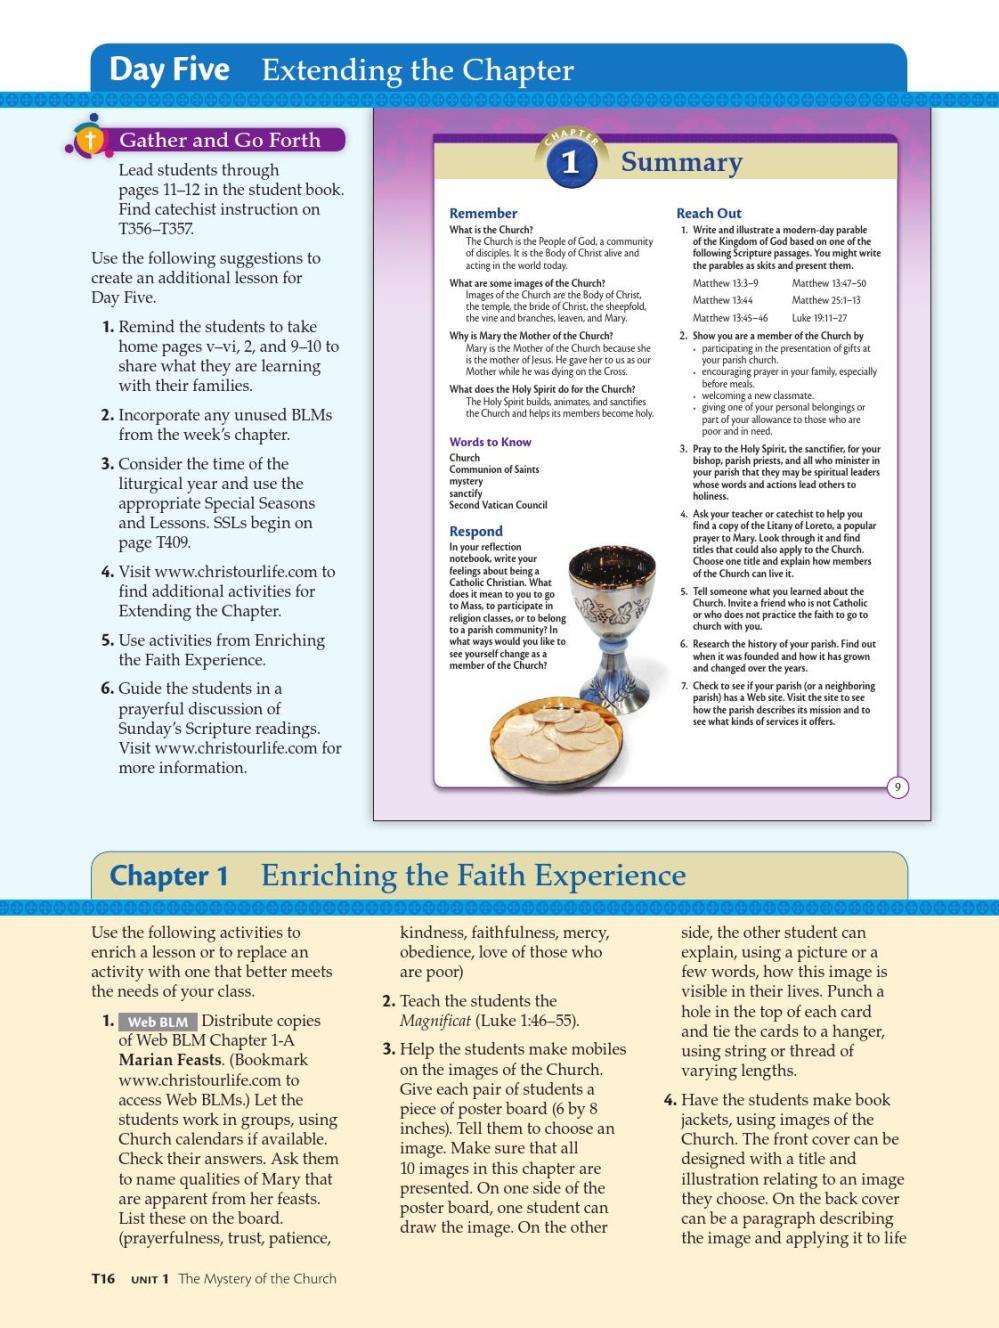 medium resolution of Christ Our Life 2016 Grade 8 Teacher School Edition by Loyola Press - issuu